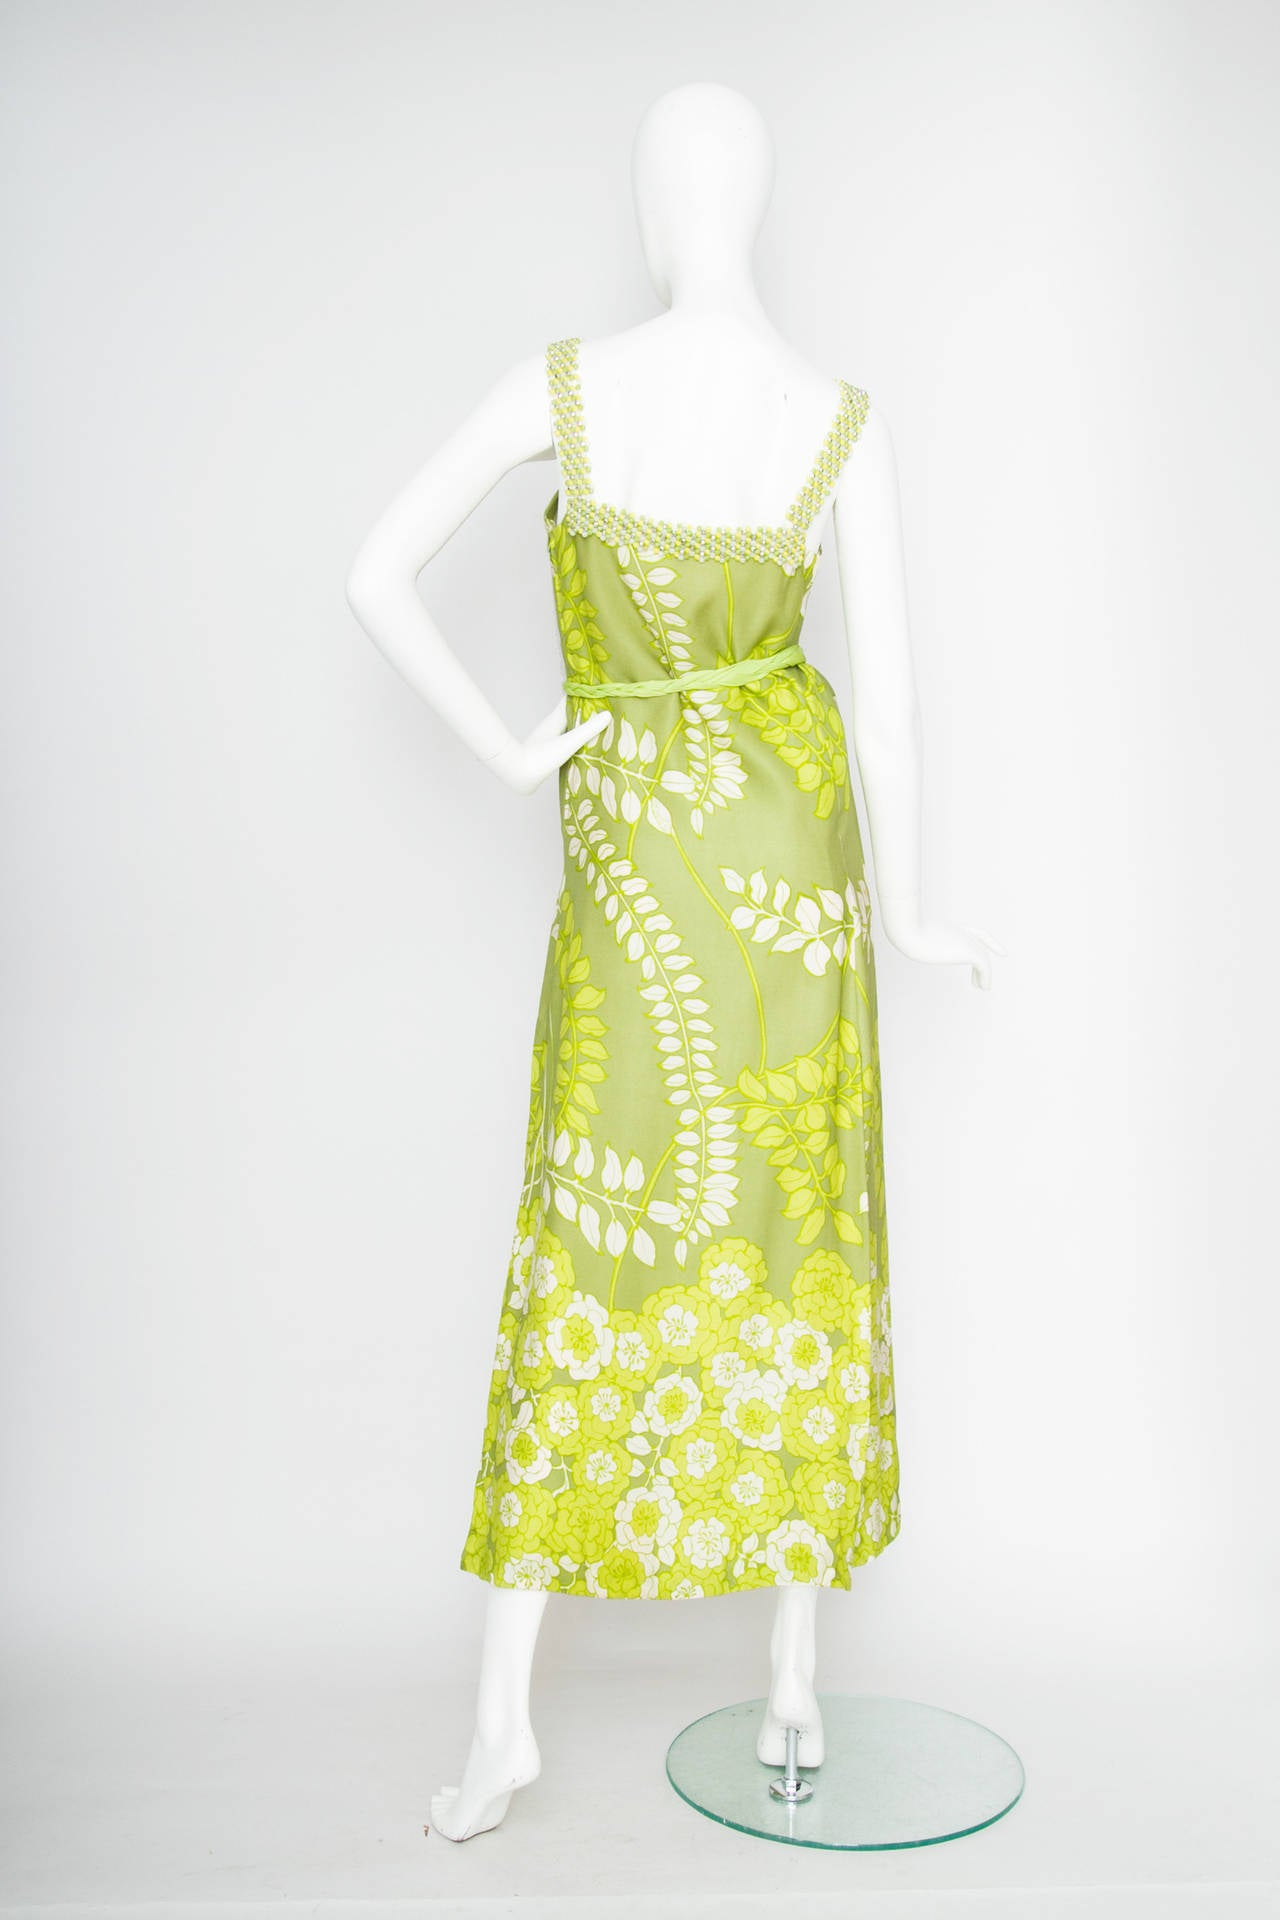 1960s Green Floral Handmade Silk Dress Size M In Good Condition For Sale In Copenhagen, DK